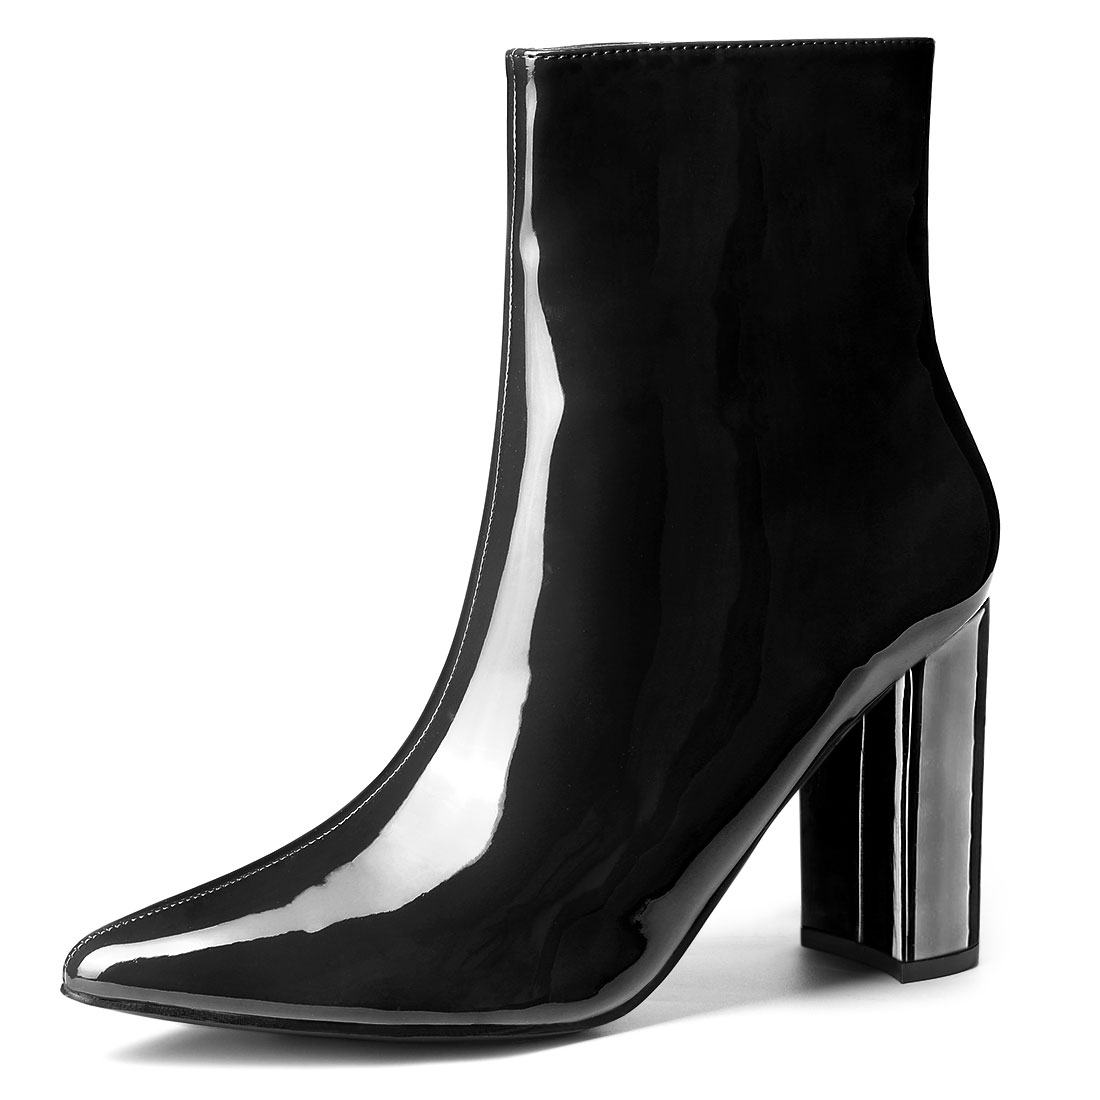 Allegra K Women's Chunky Heel Pointed Toe Zip Ankle Boots Black US 6